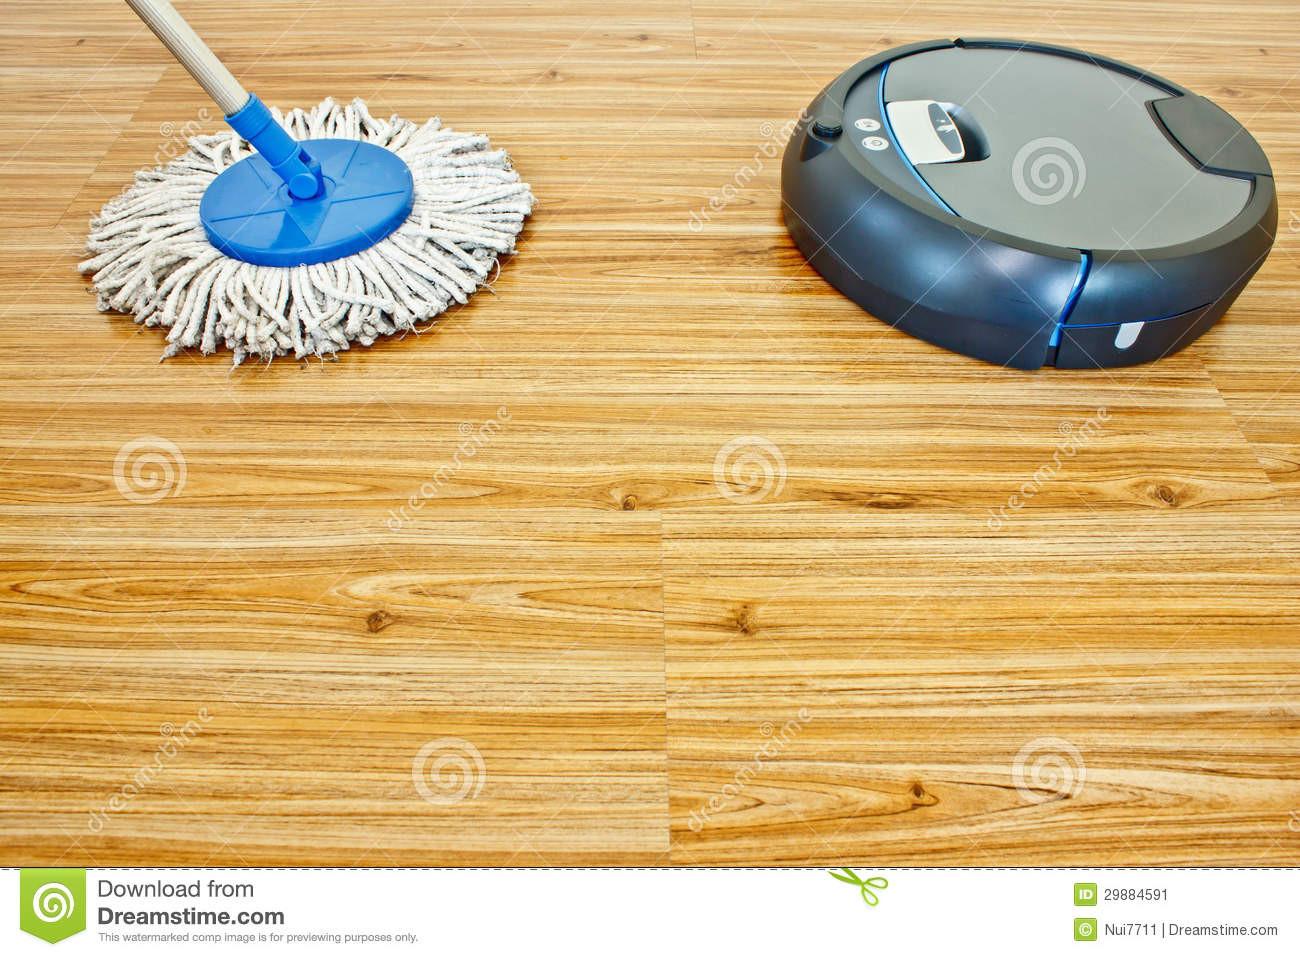 laminate flooring versus hardwood of floor washing robot and traditional mop 1 stock image image of for floor washing robot and traditional mop on laminate wood floor